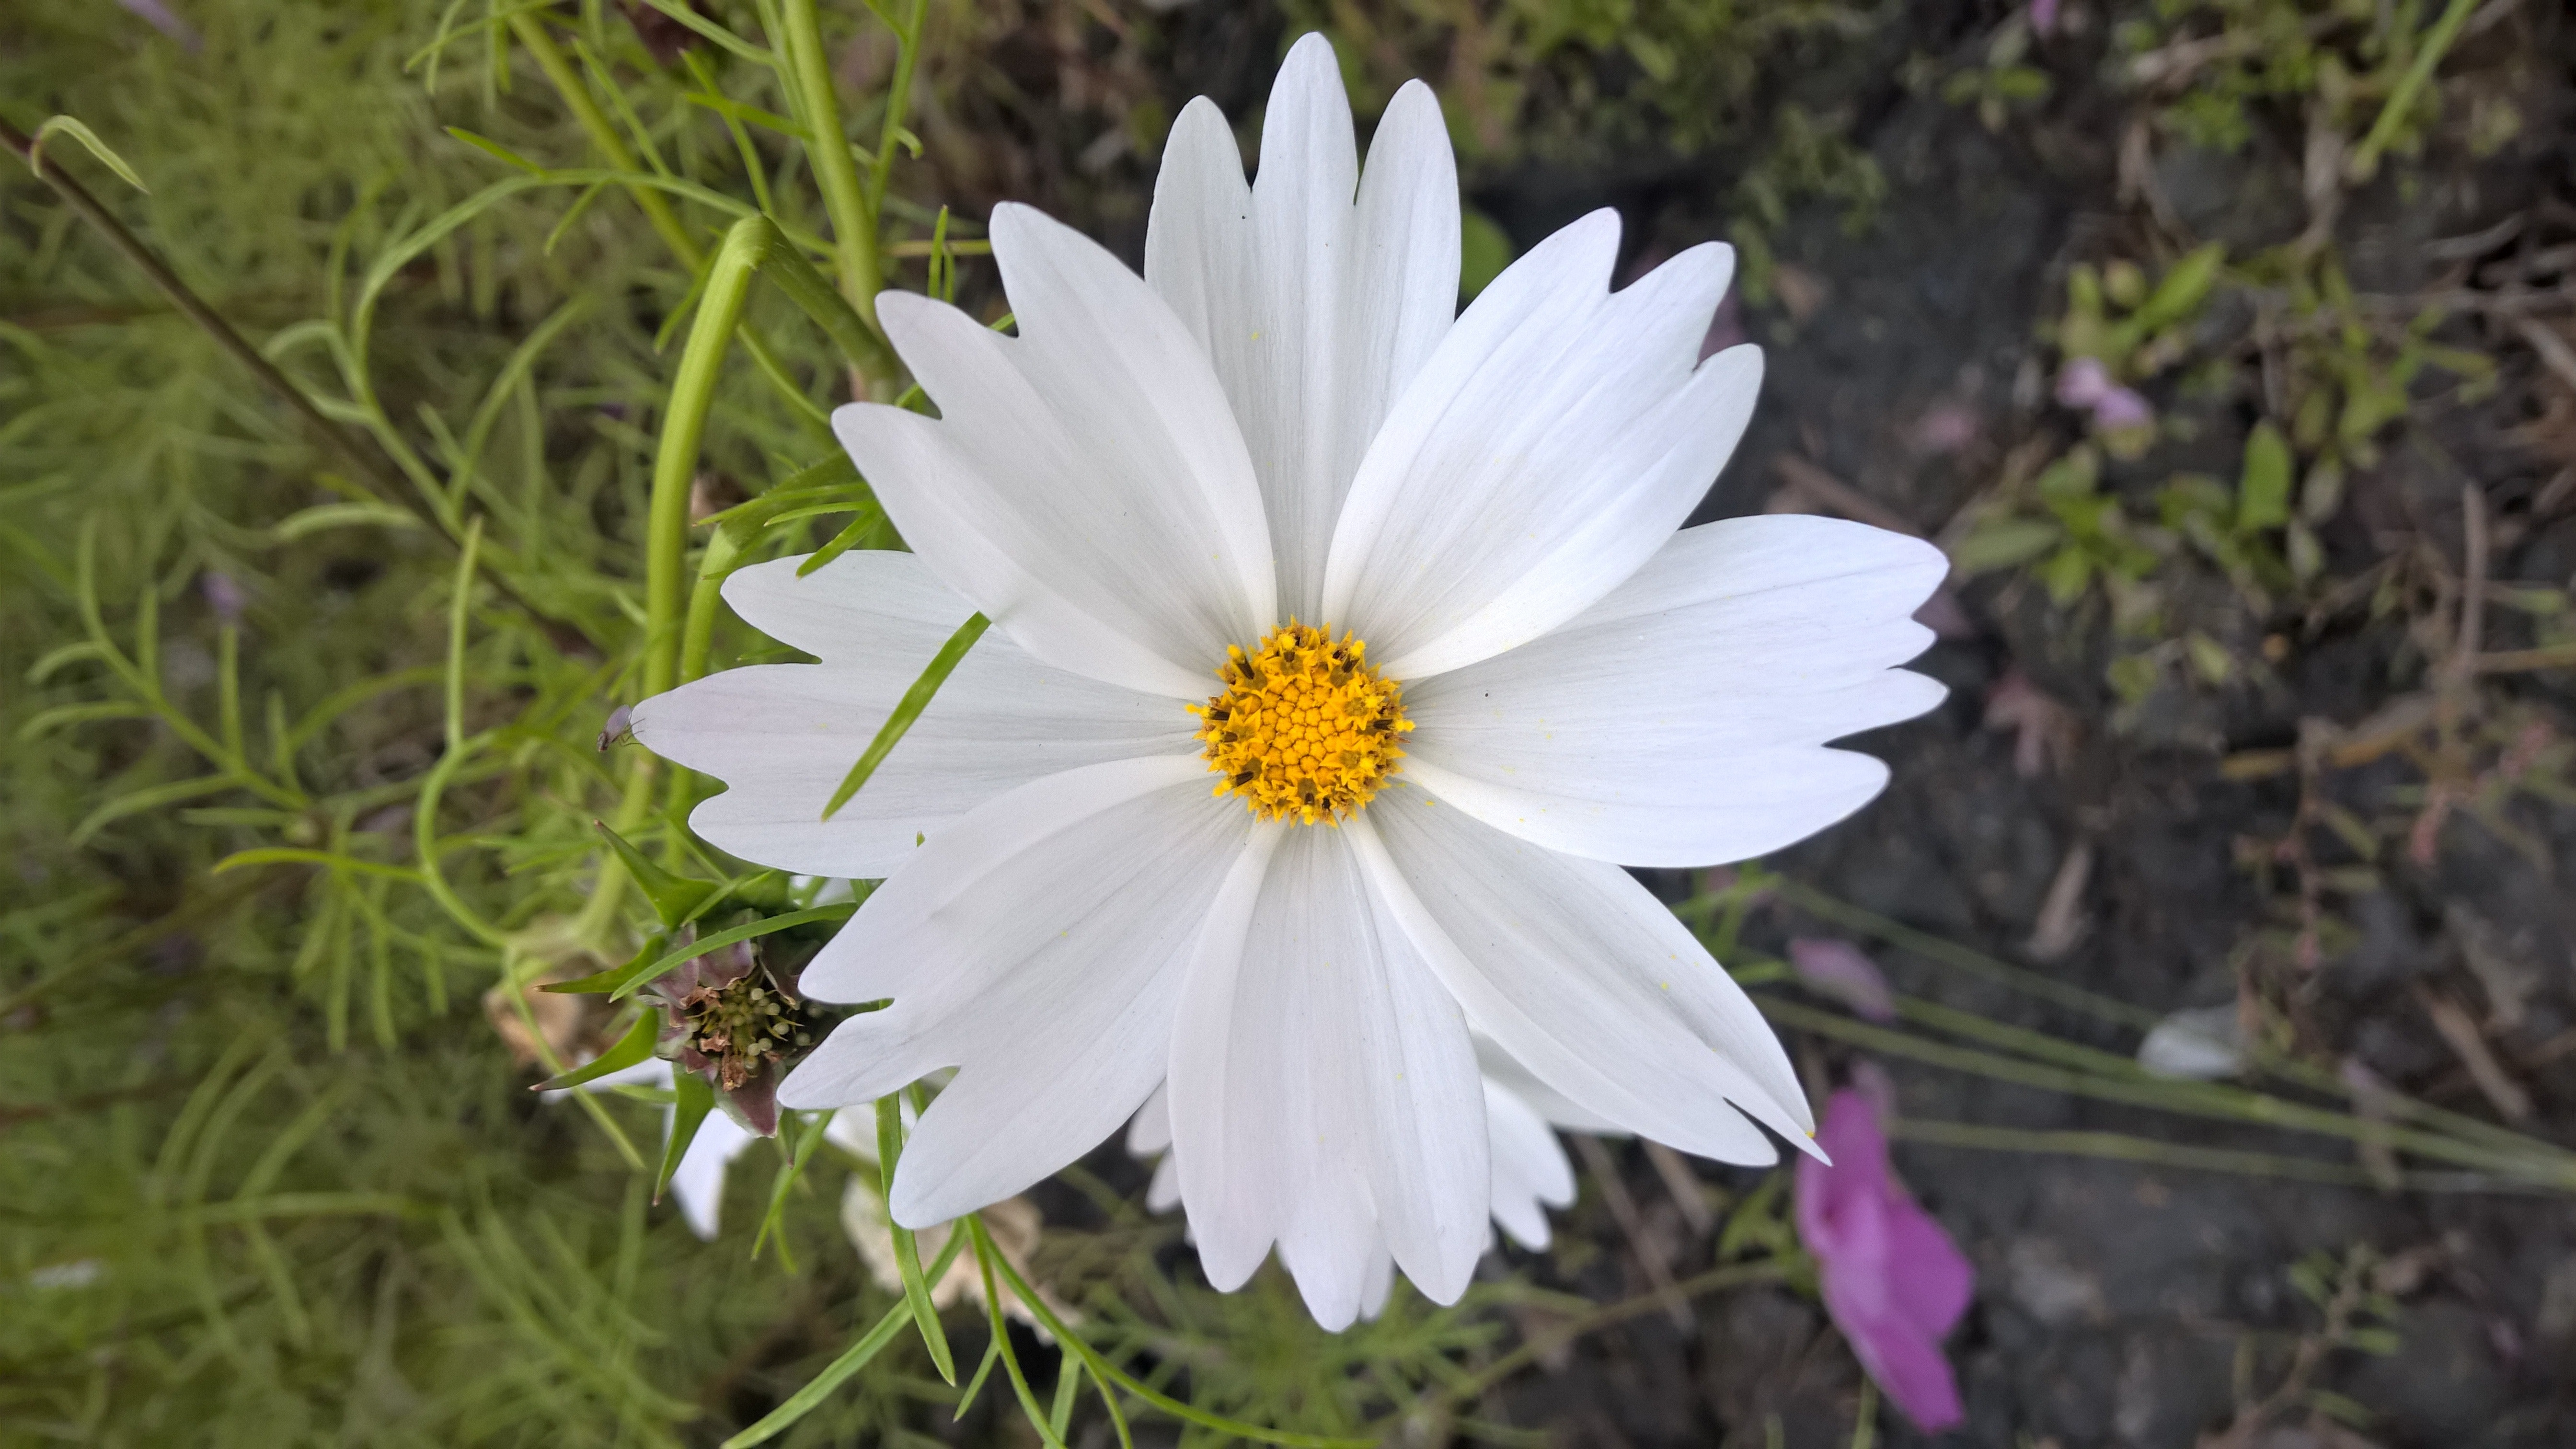 Foto Stok Gratis Tentang Bunga Hijau Kacang